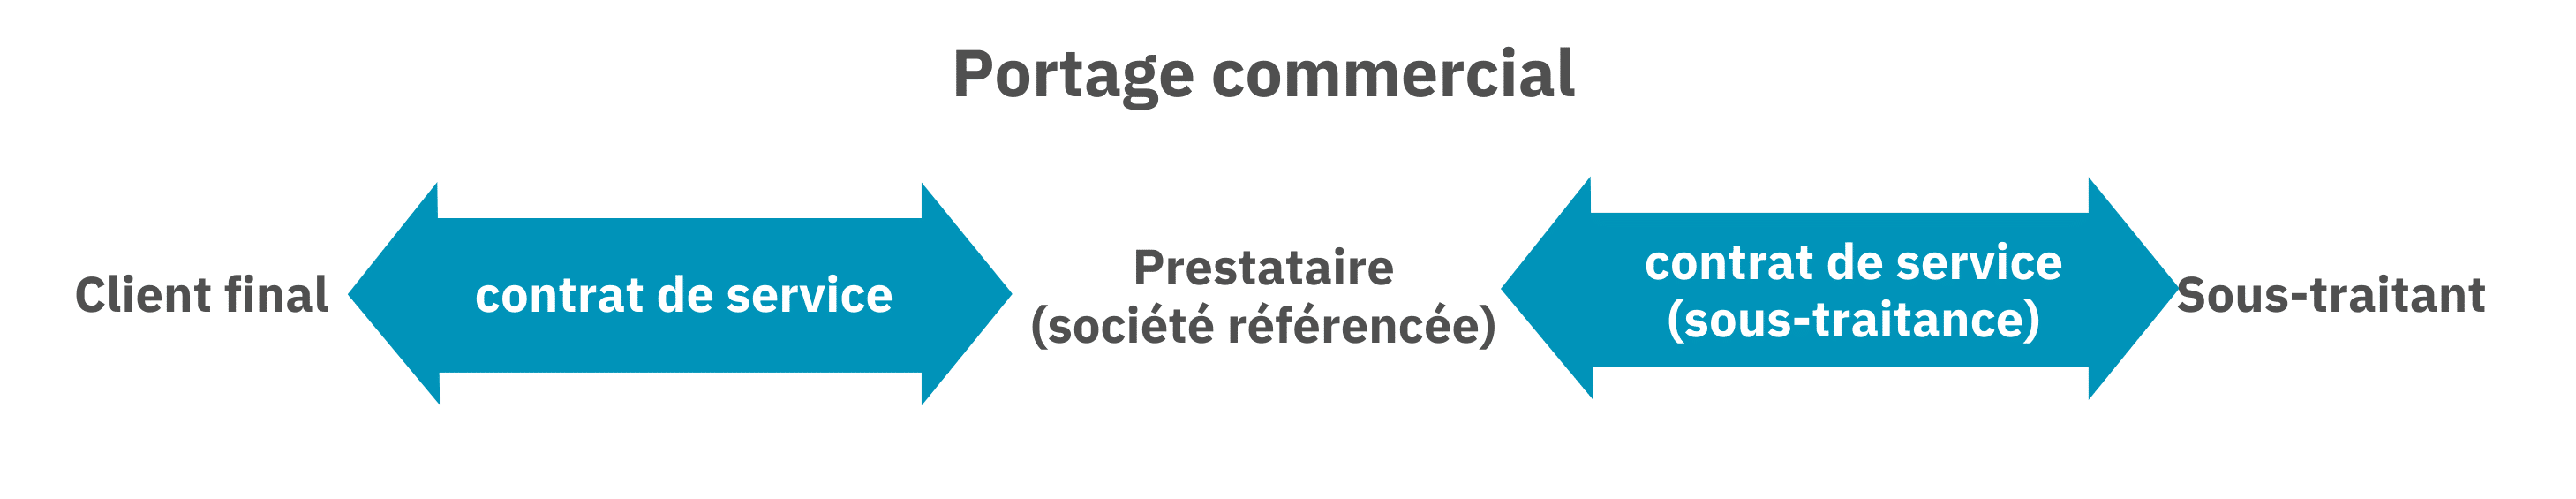 Organisation du portage commercial